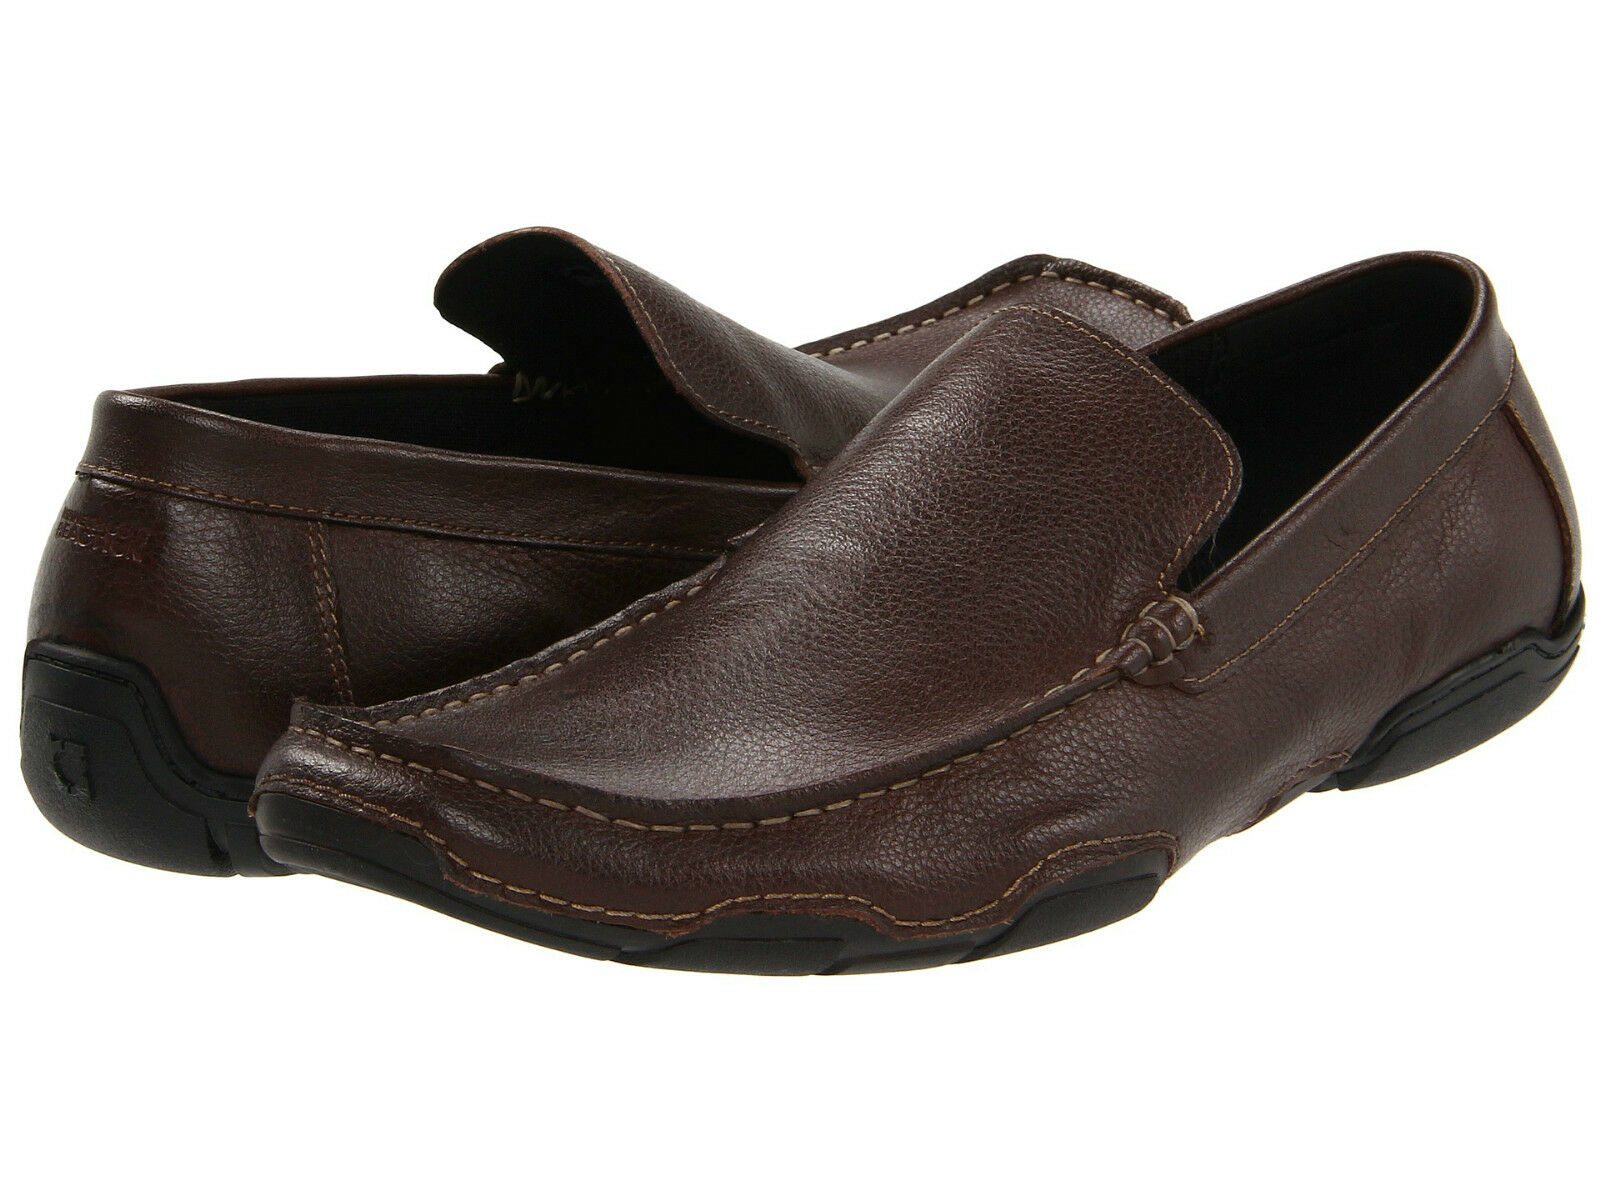 Scarpe casual da uomo 9.5 KENNETH COLE uomos Shoe (Choose Brown or Green Color) Reg0 Sale.99